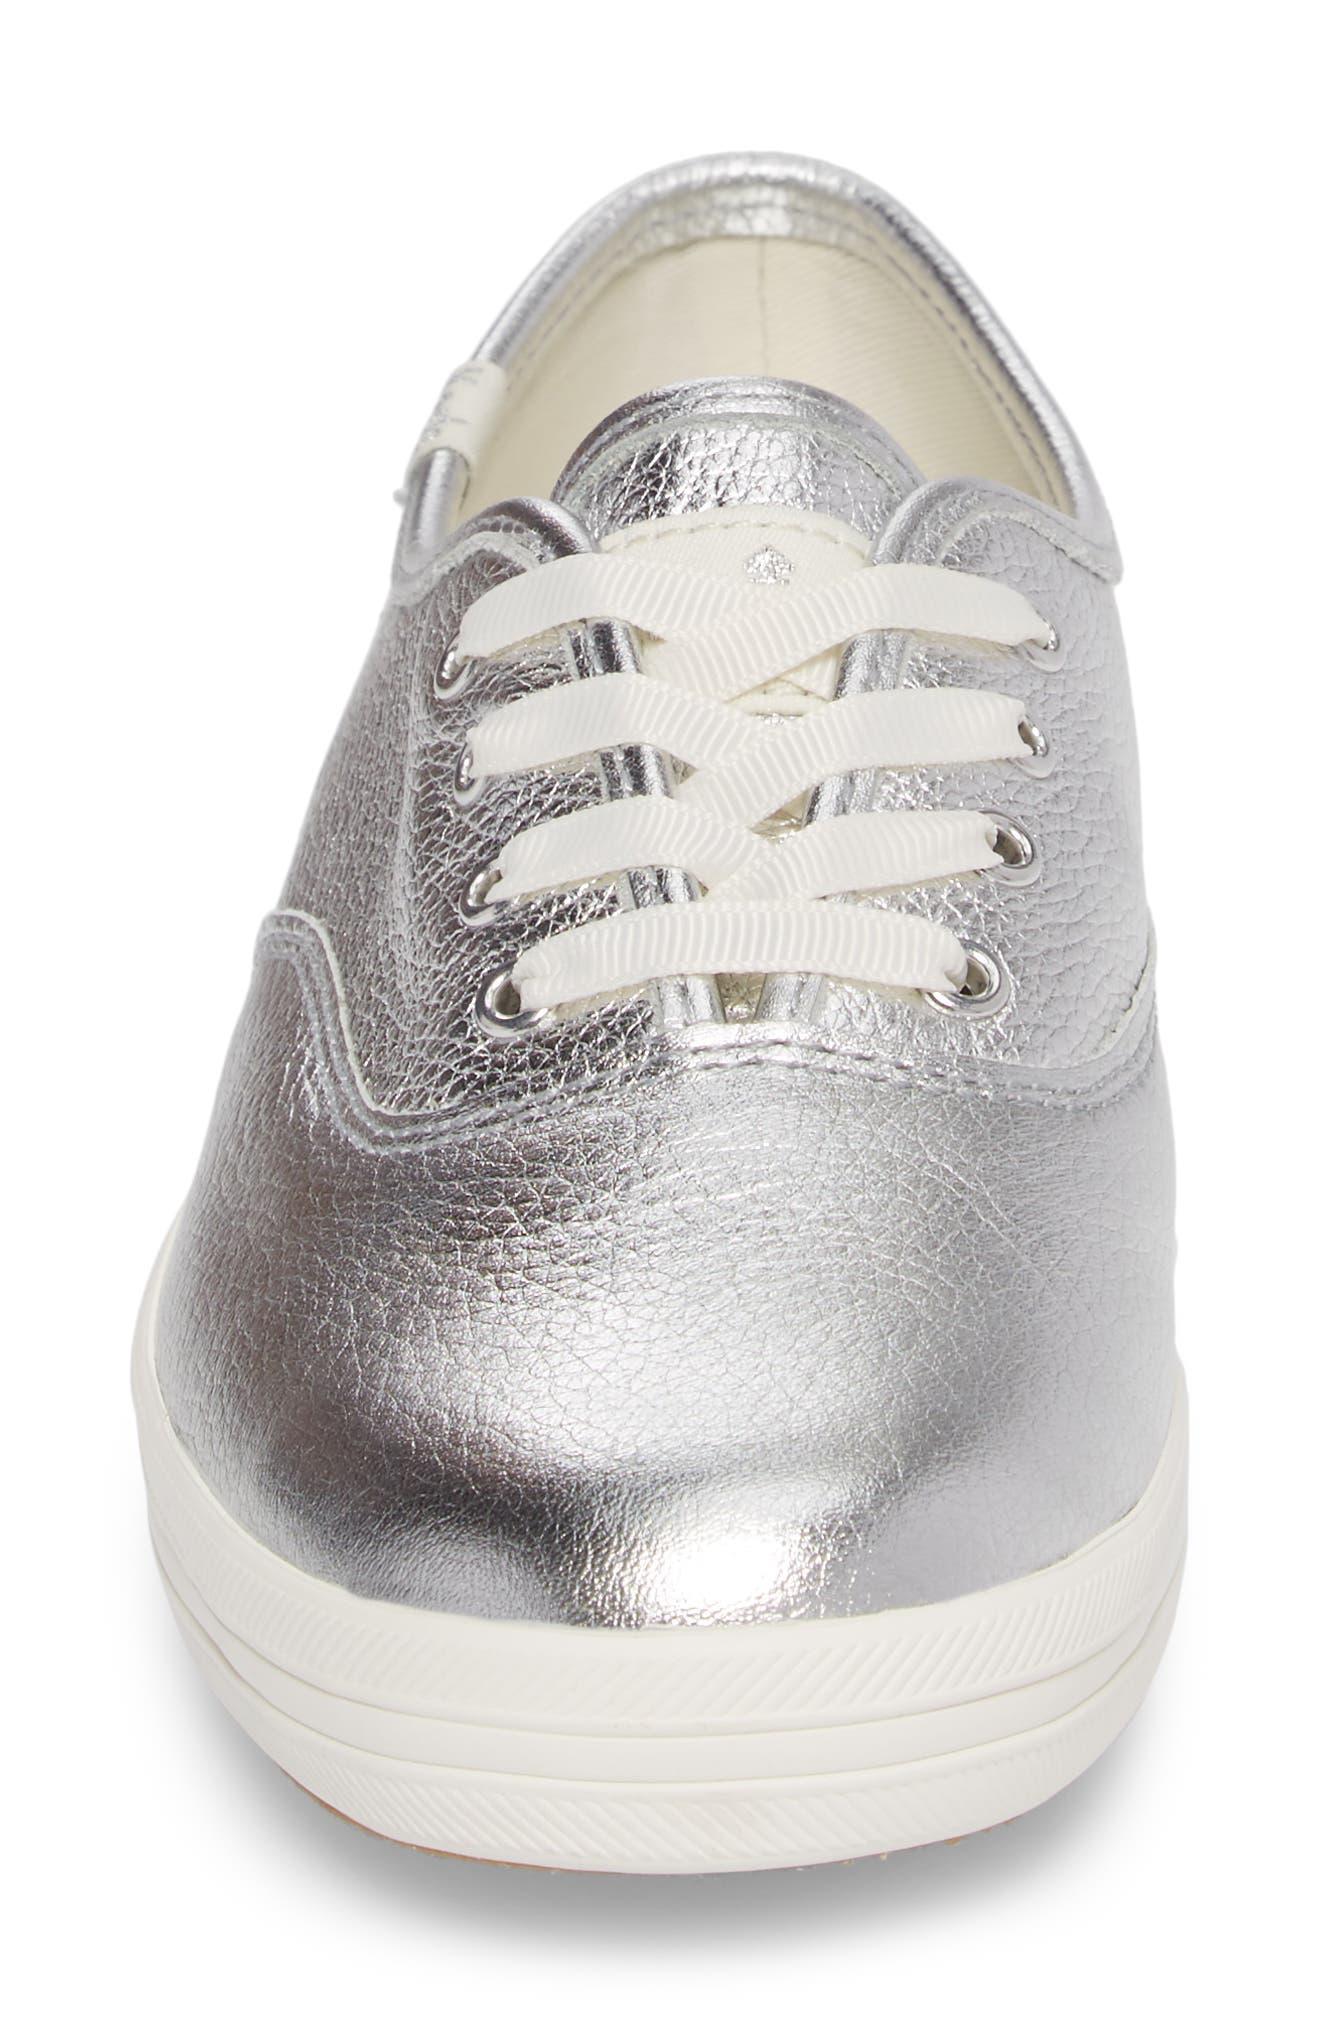 metallic sneaker,                             Alternate thumbnail 4, color,                             040